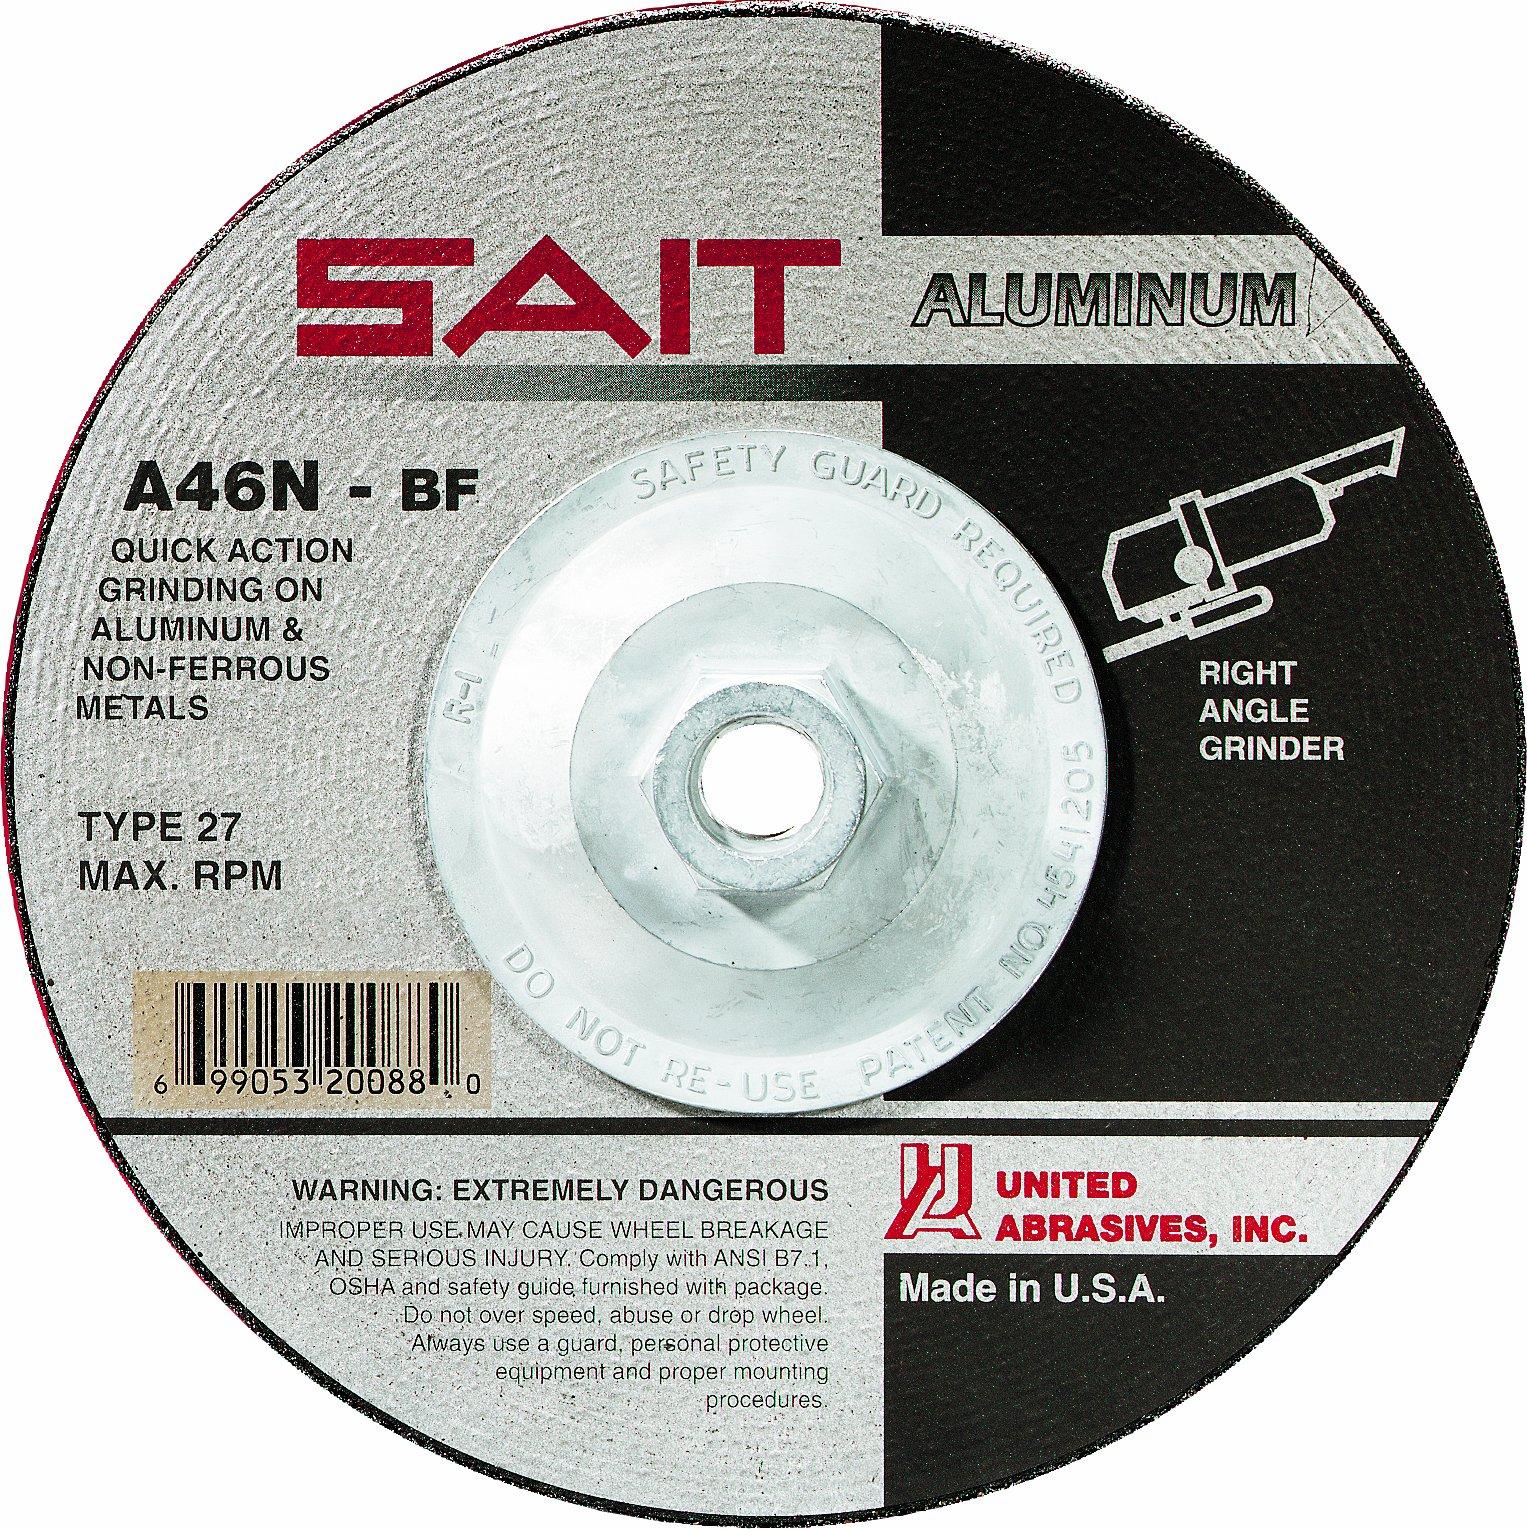 United Abrasives-SAIT 20088 Type 27 7-Inch x 1/4-Inch x 5/8-11-Inch A46N Aluminum Depressed Center Grinding Wheels, 10-Pack by United Abrasives- SAIT (Image #1)